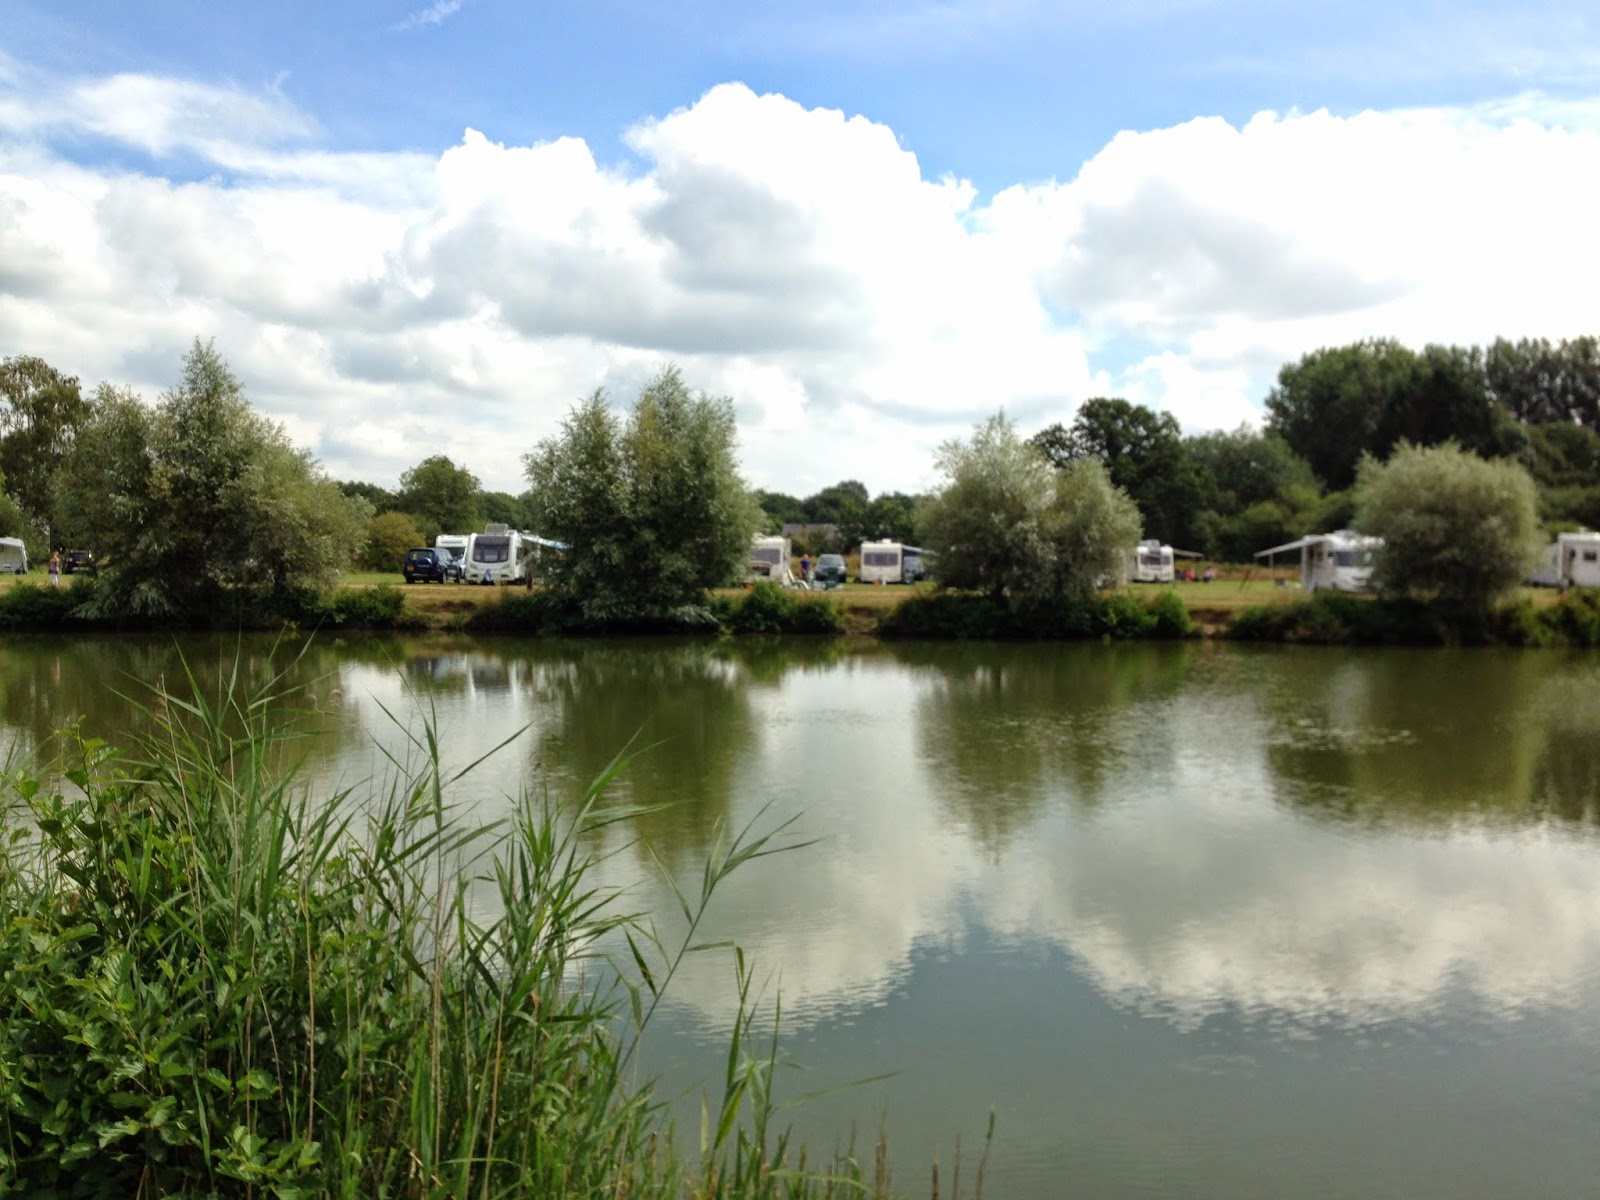 A view of caravans across Somerley Lakes